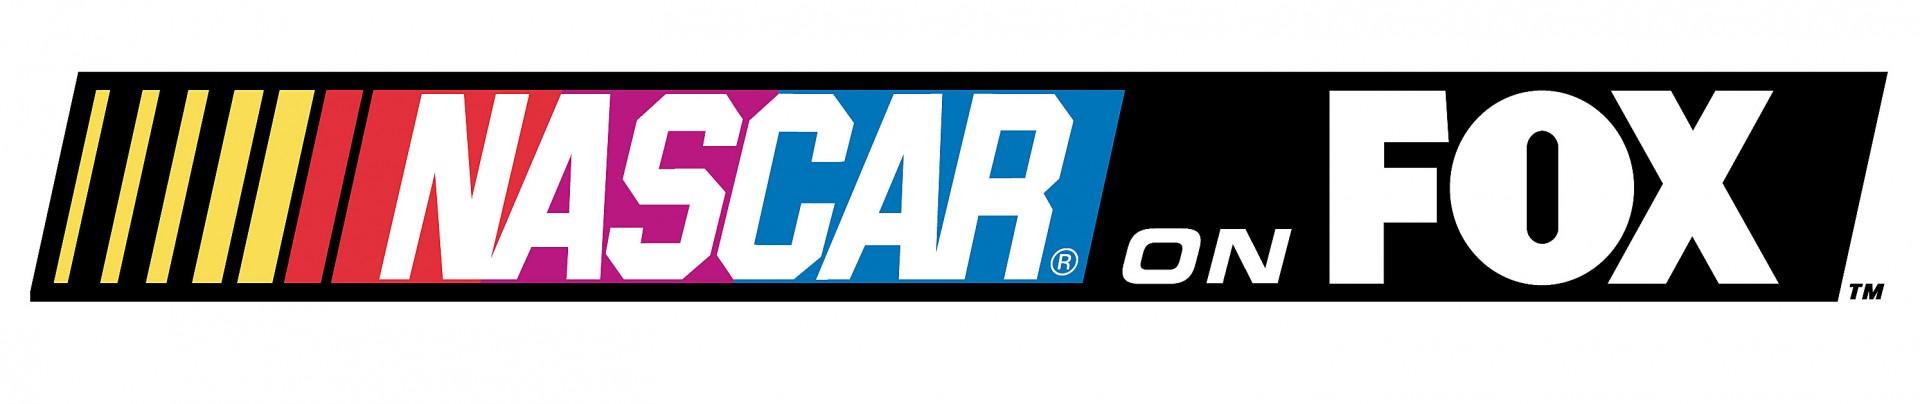 Fox NASCAR